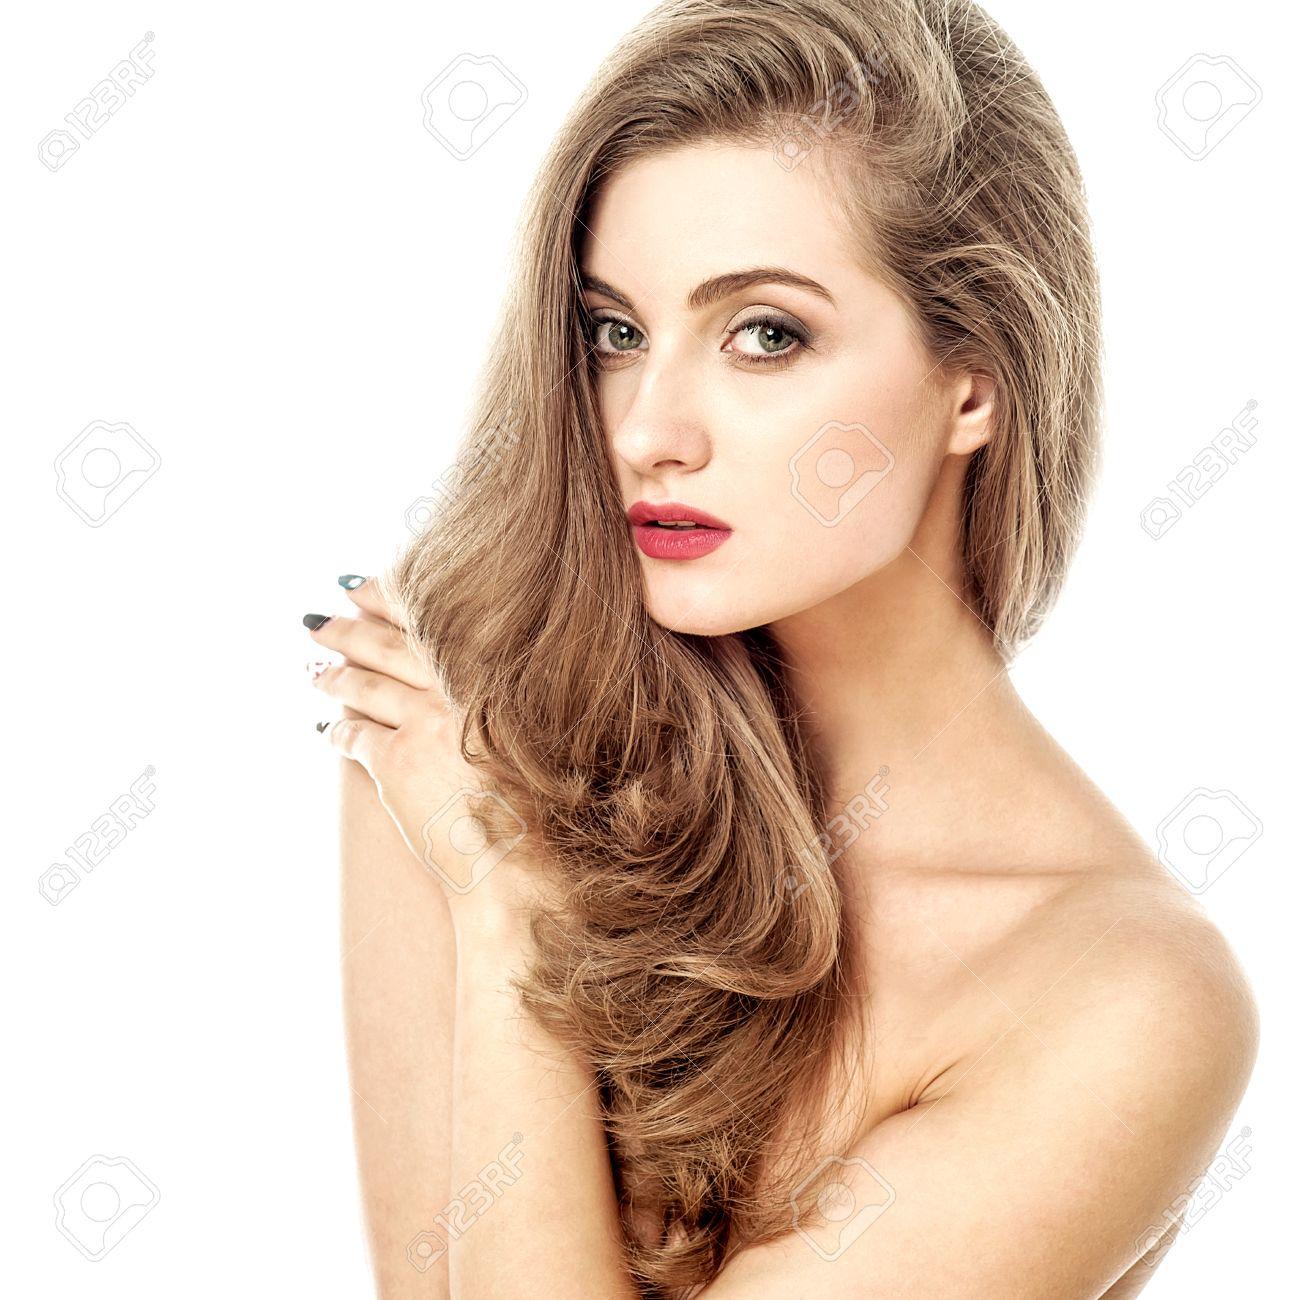 Sensual Modelo De Mujer Desnuda Frente A La Cámara